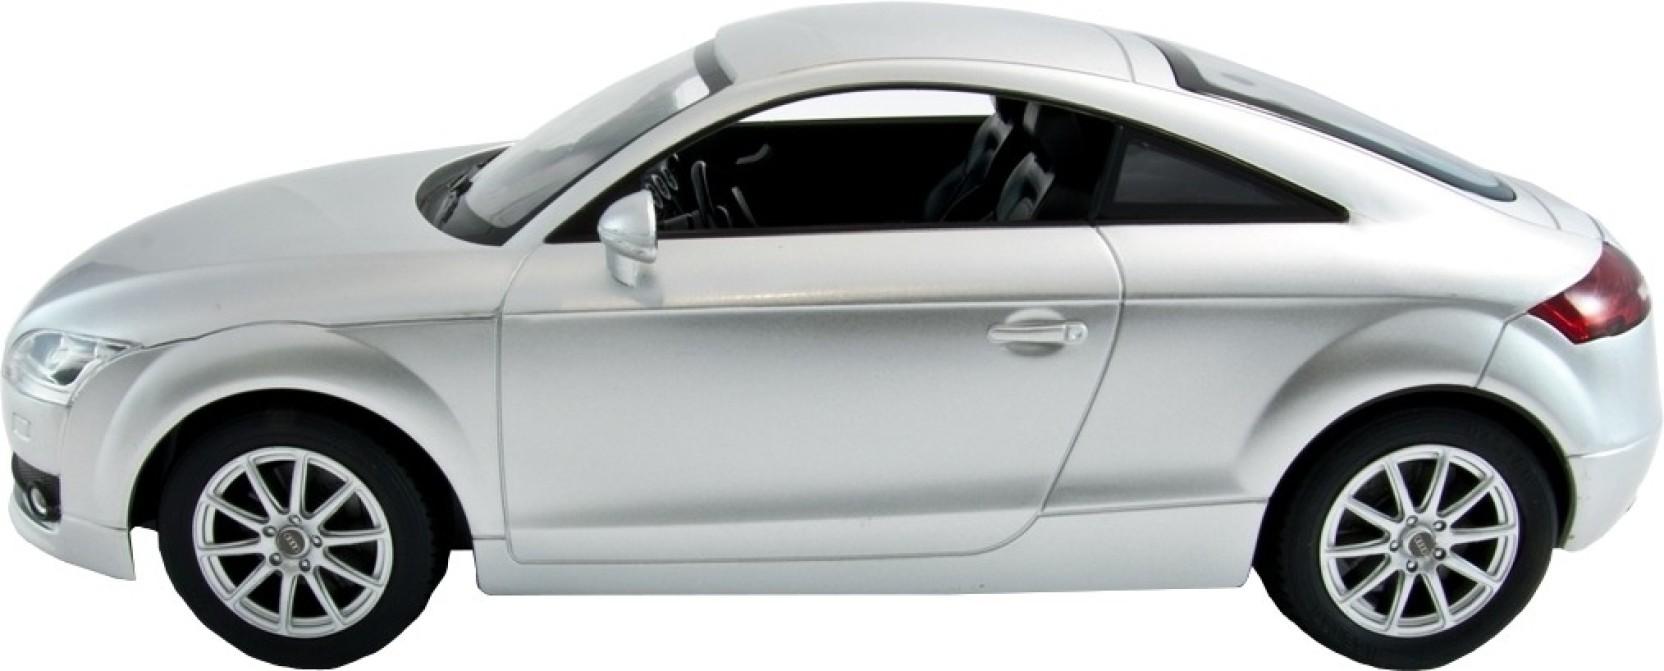 Rastar Audi Tt Audi Tt Shop For Rastar Products In India Toys For 6 12 Years Kids